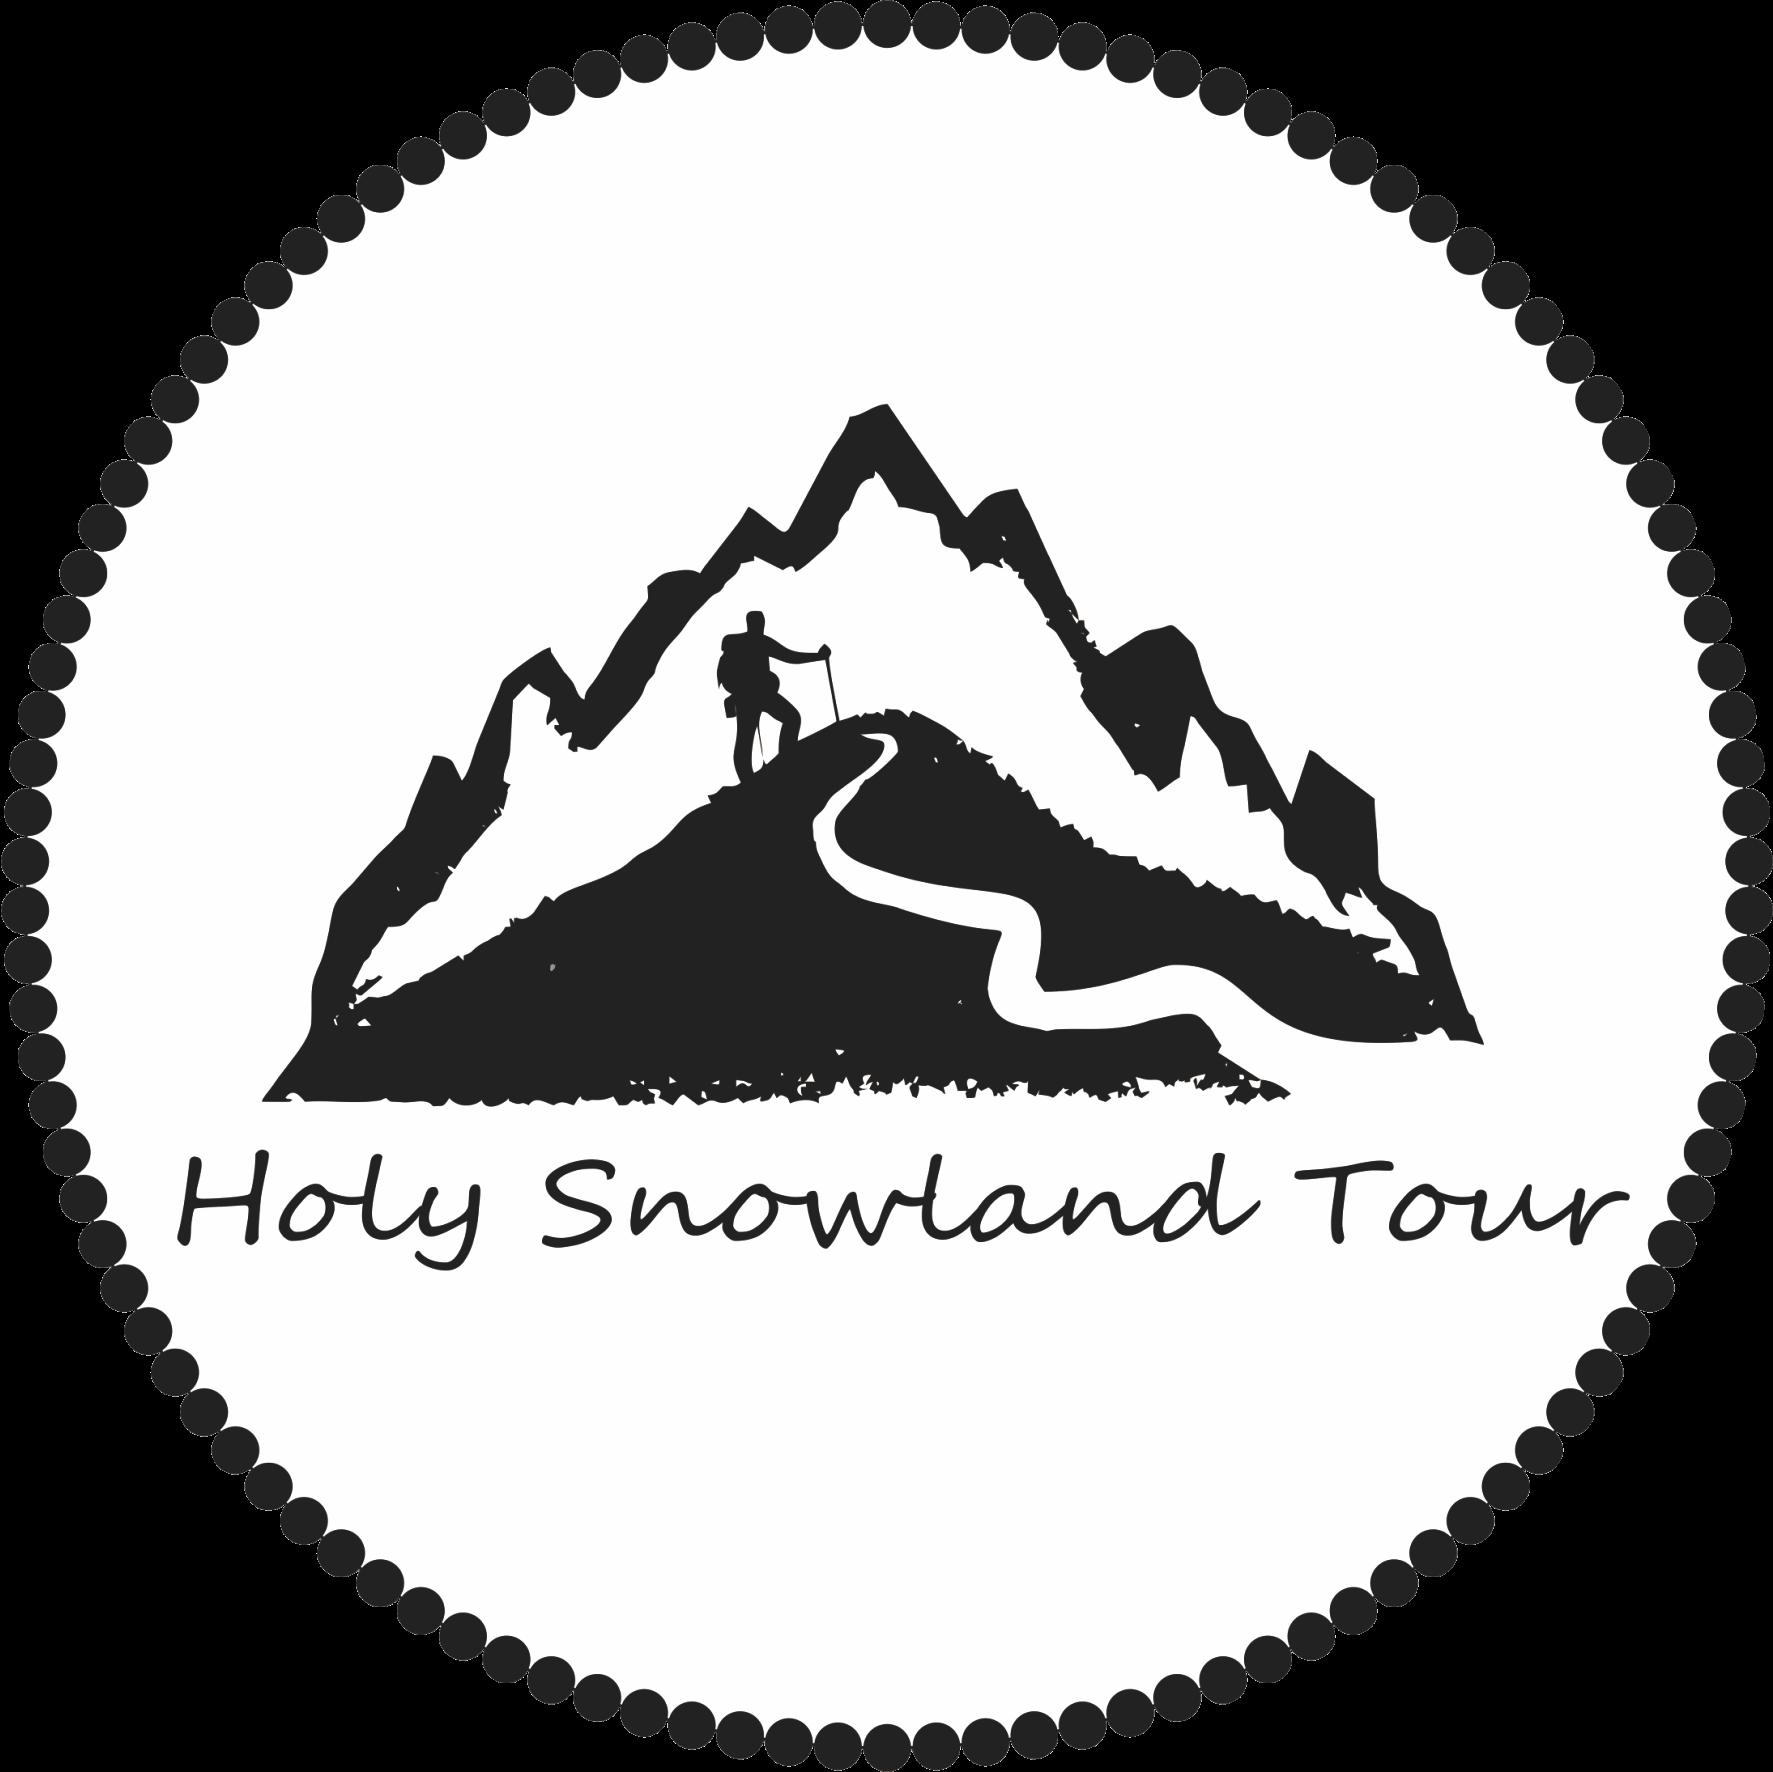 Holy Snowland Tour